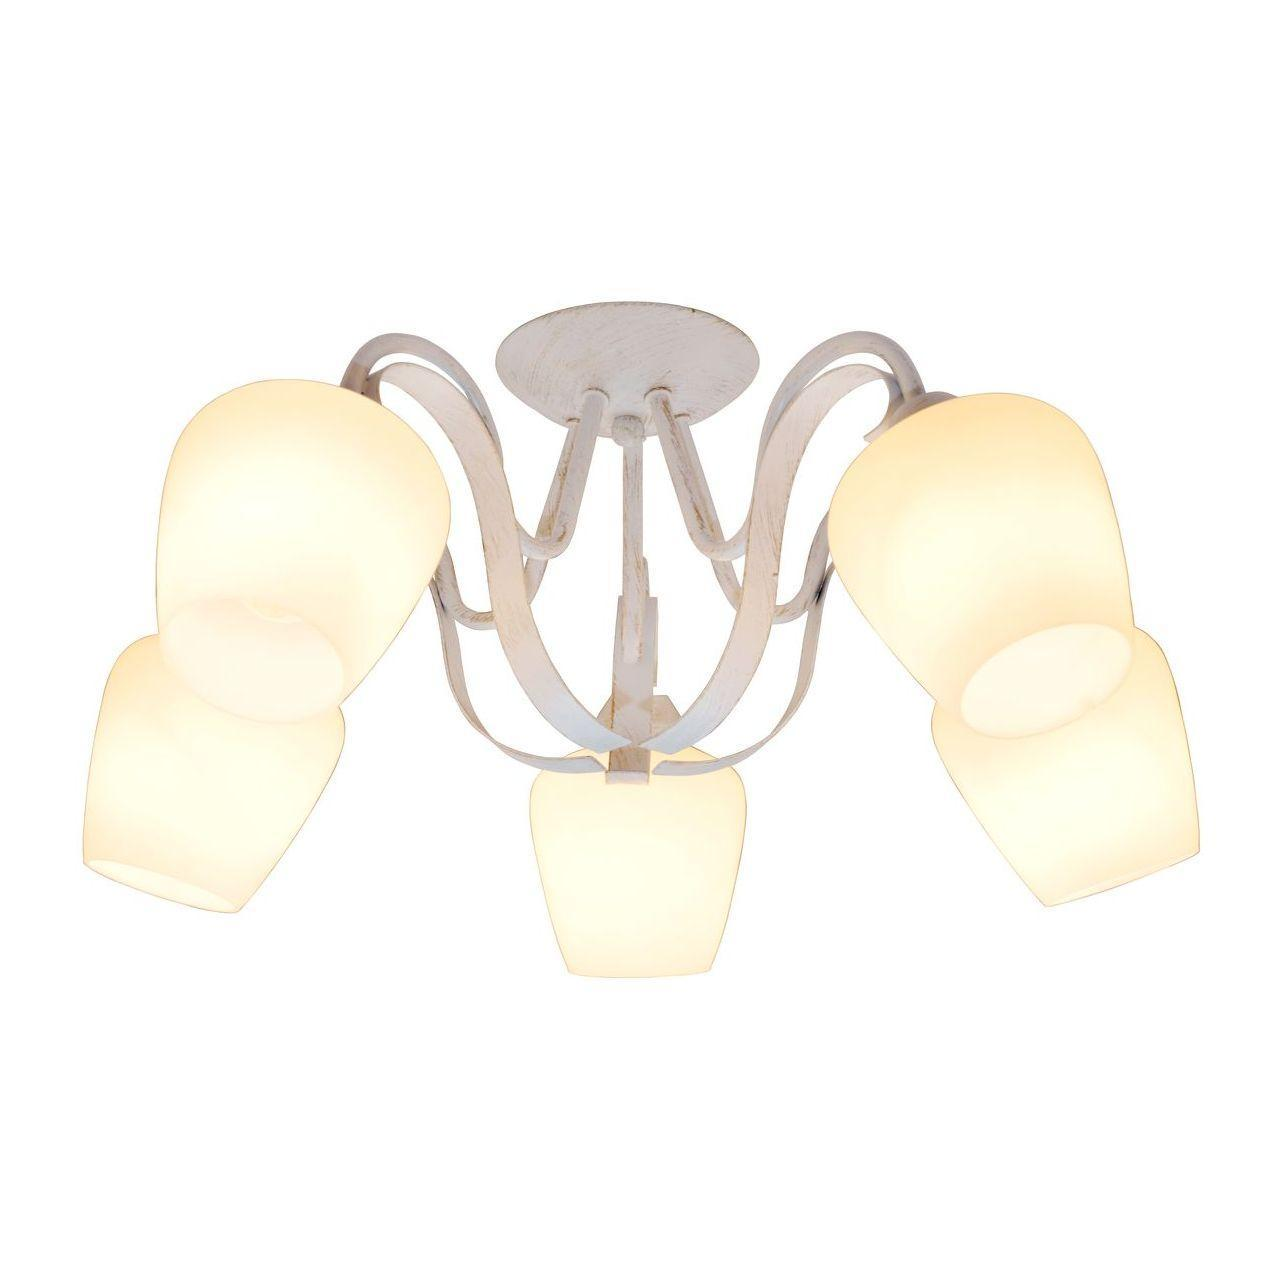 Люстра Toplight Abegail TL1133-5D потолочная люстра toplight abegail tl1133 3d